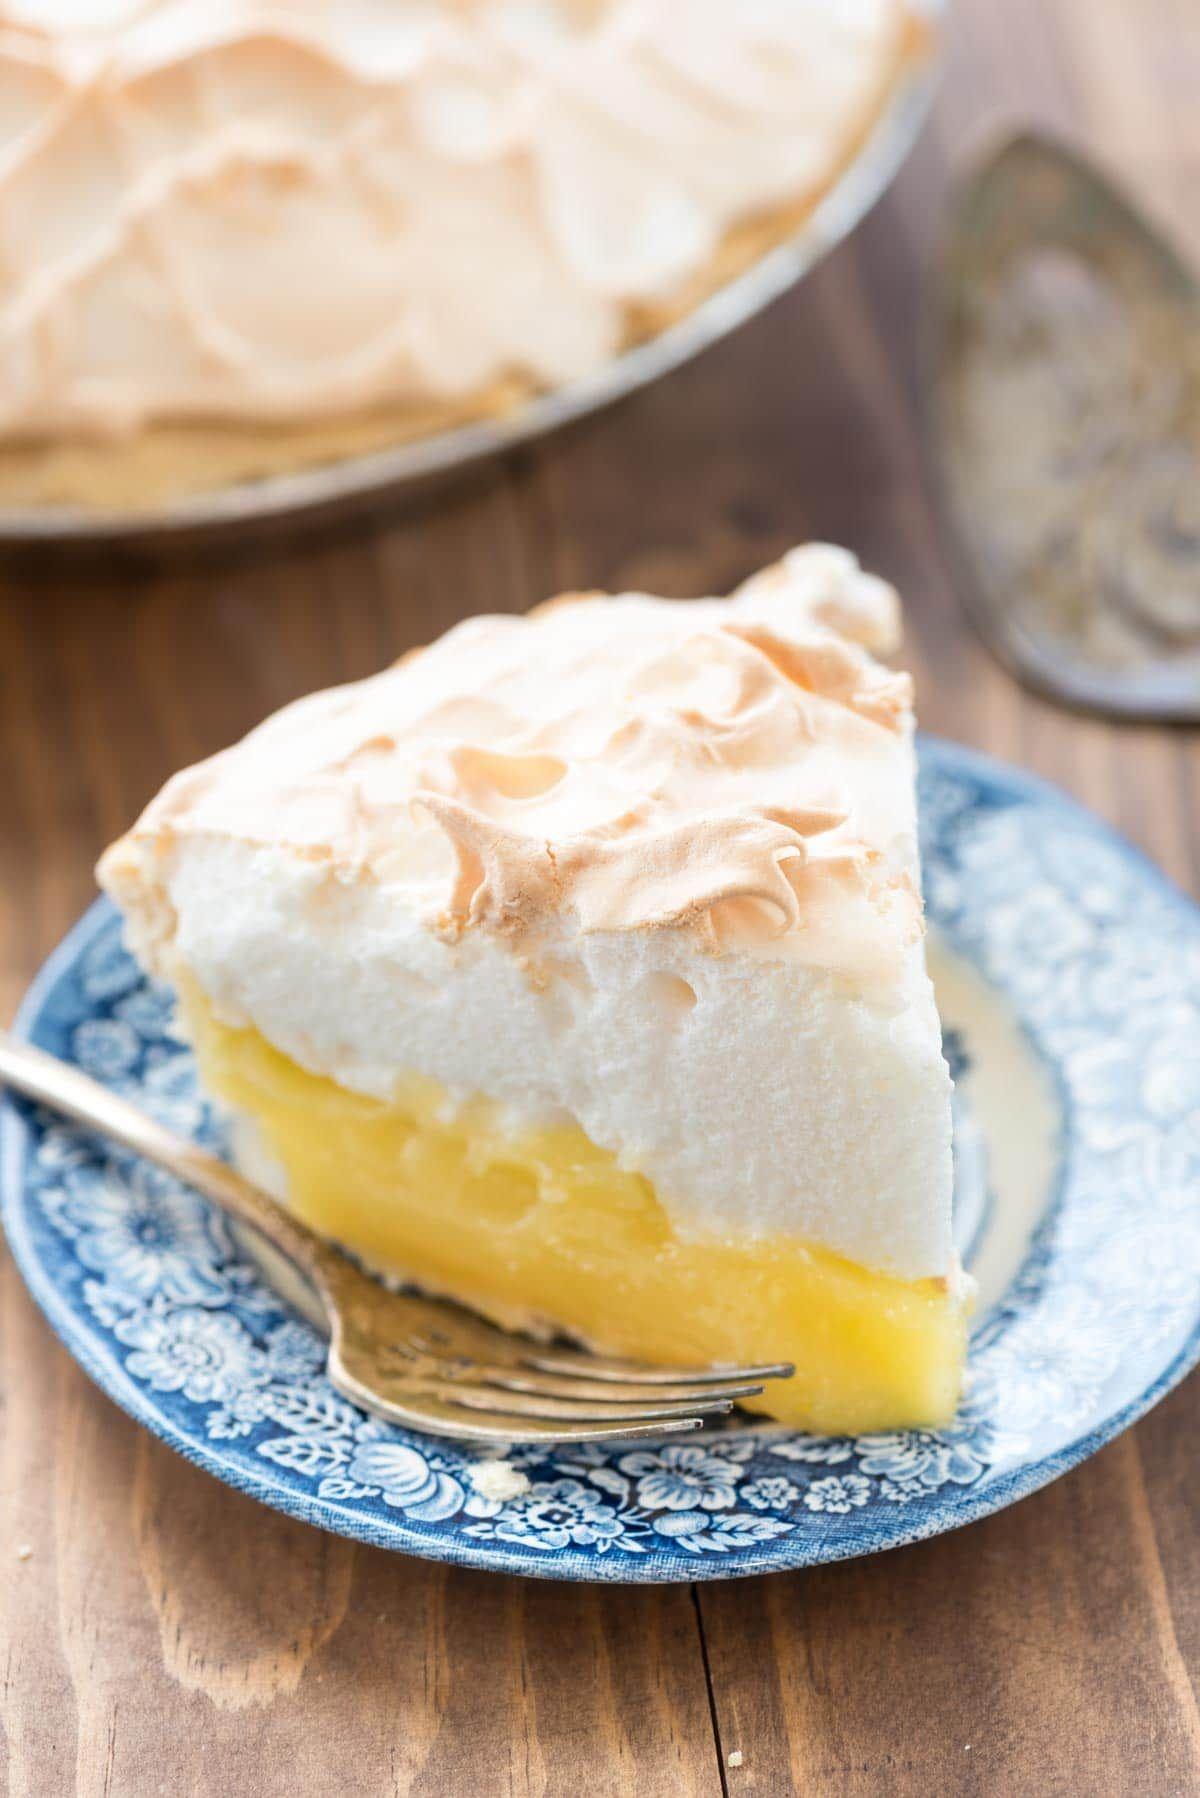 Aunt Tootsie's Lemon Meringue Pie #lemonmeringuecupcakes